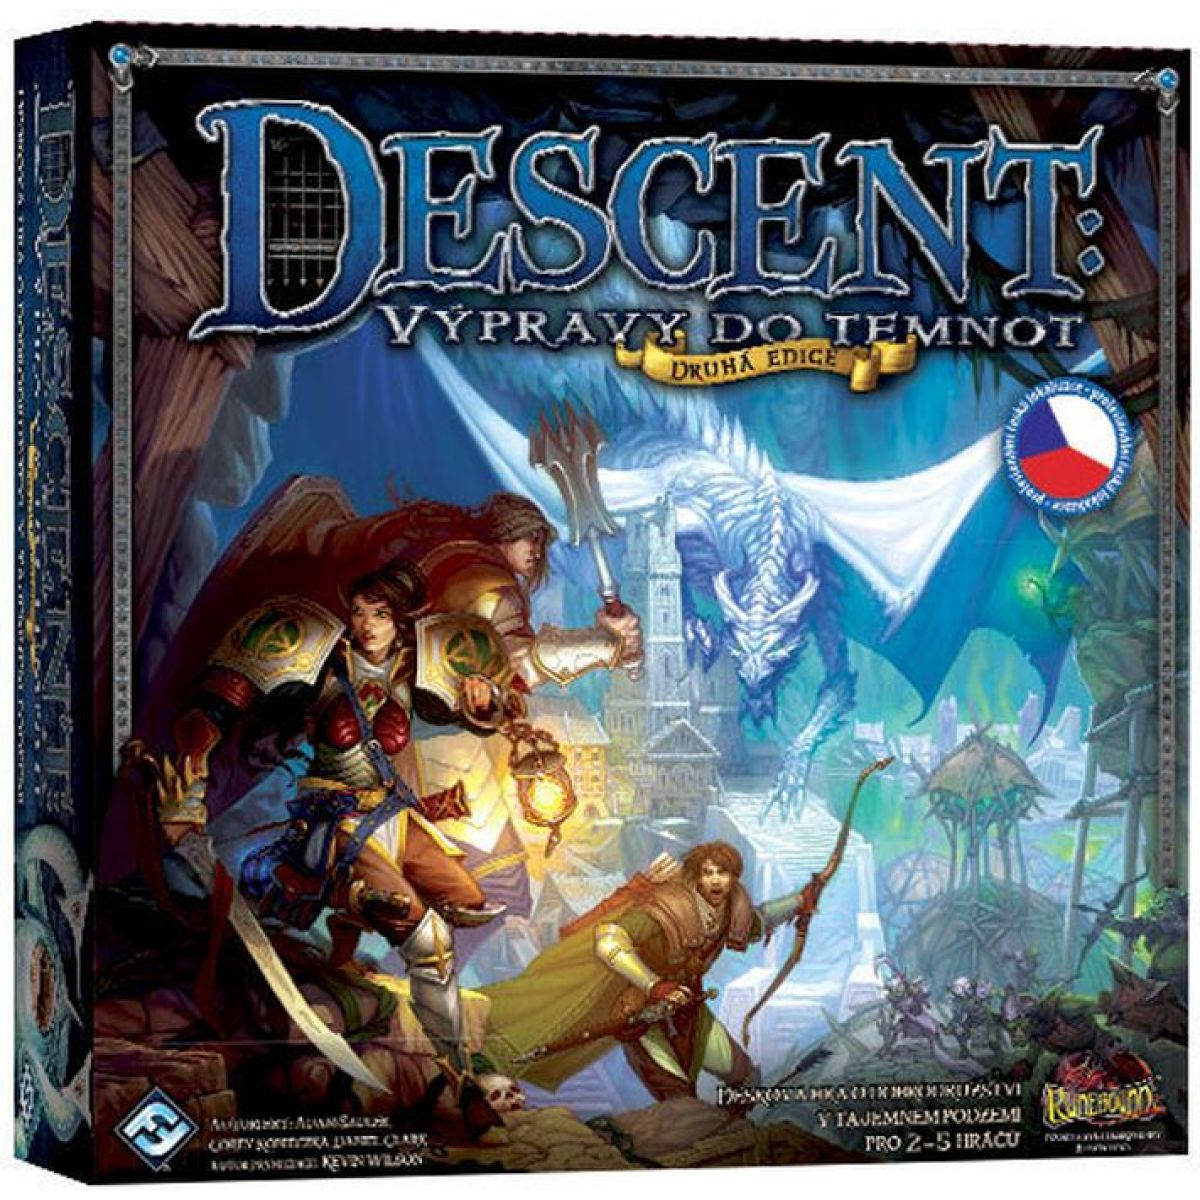 ADC Blackfire Descent Výprava do temnot - druhá edice